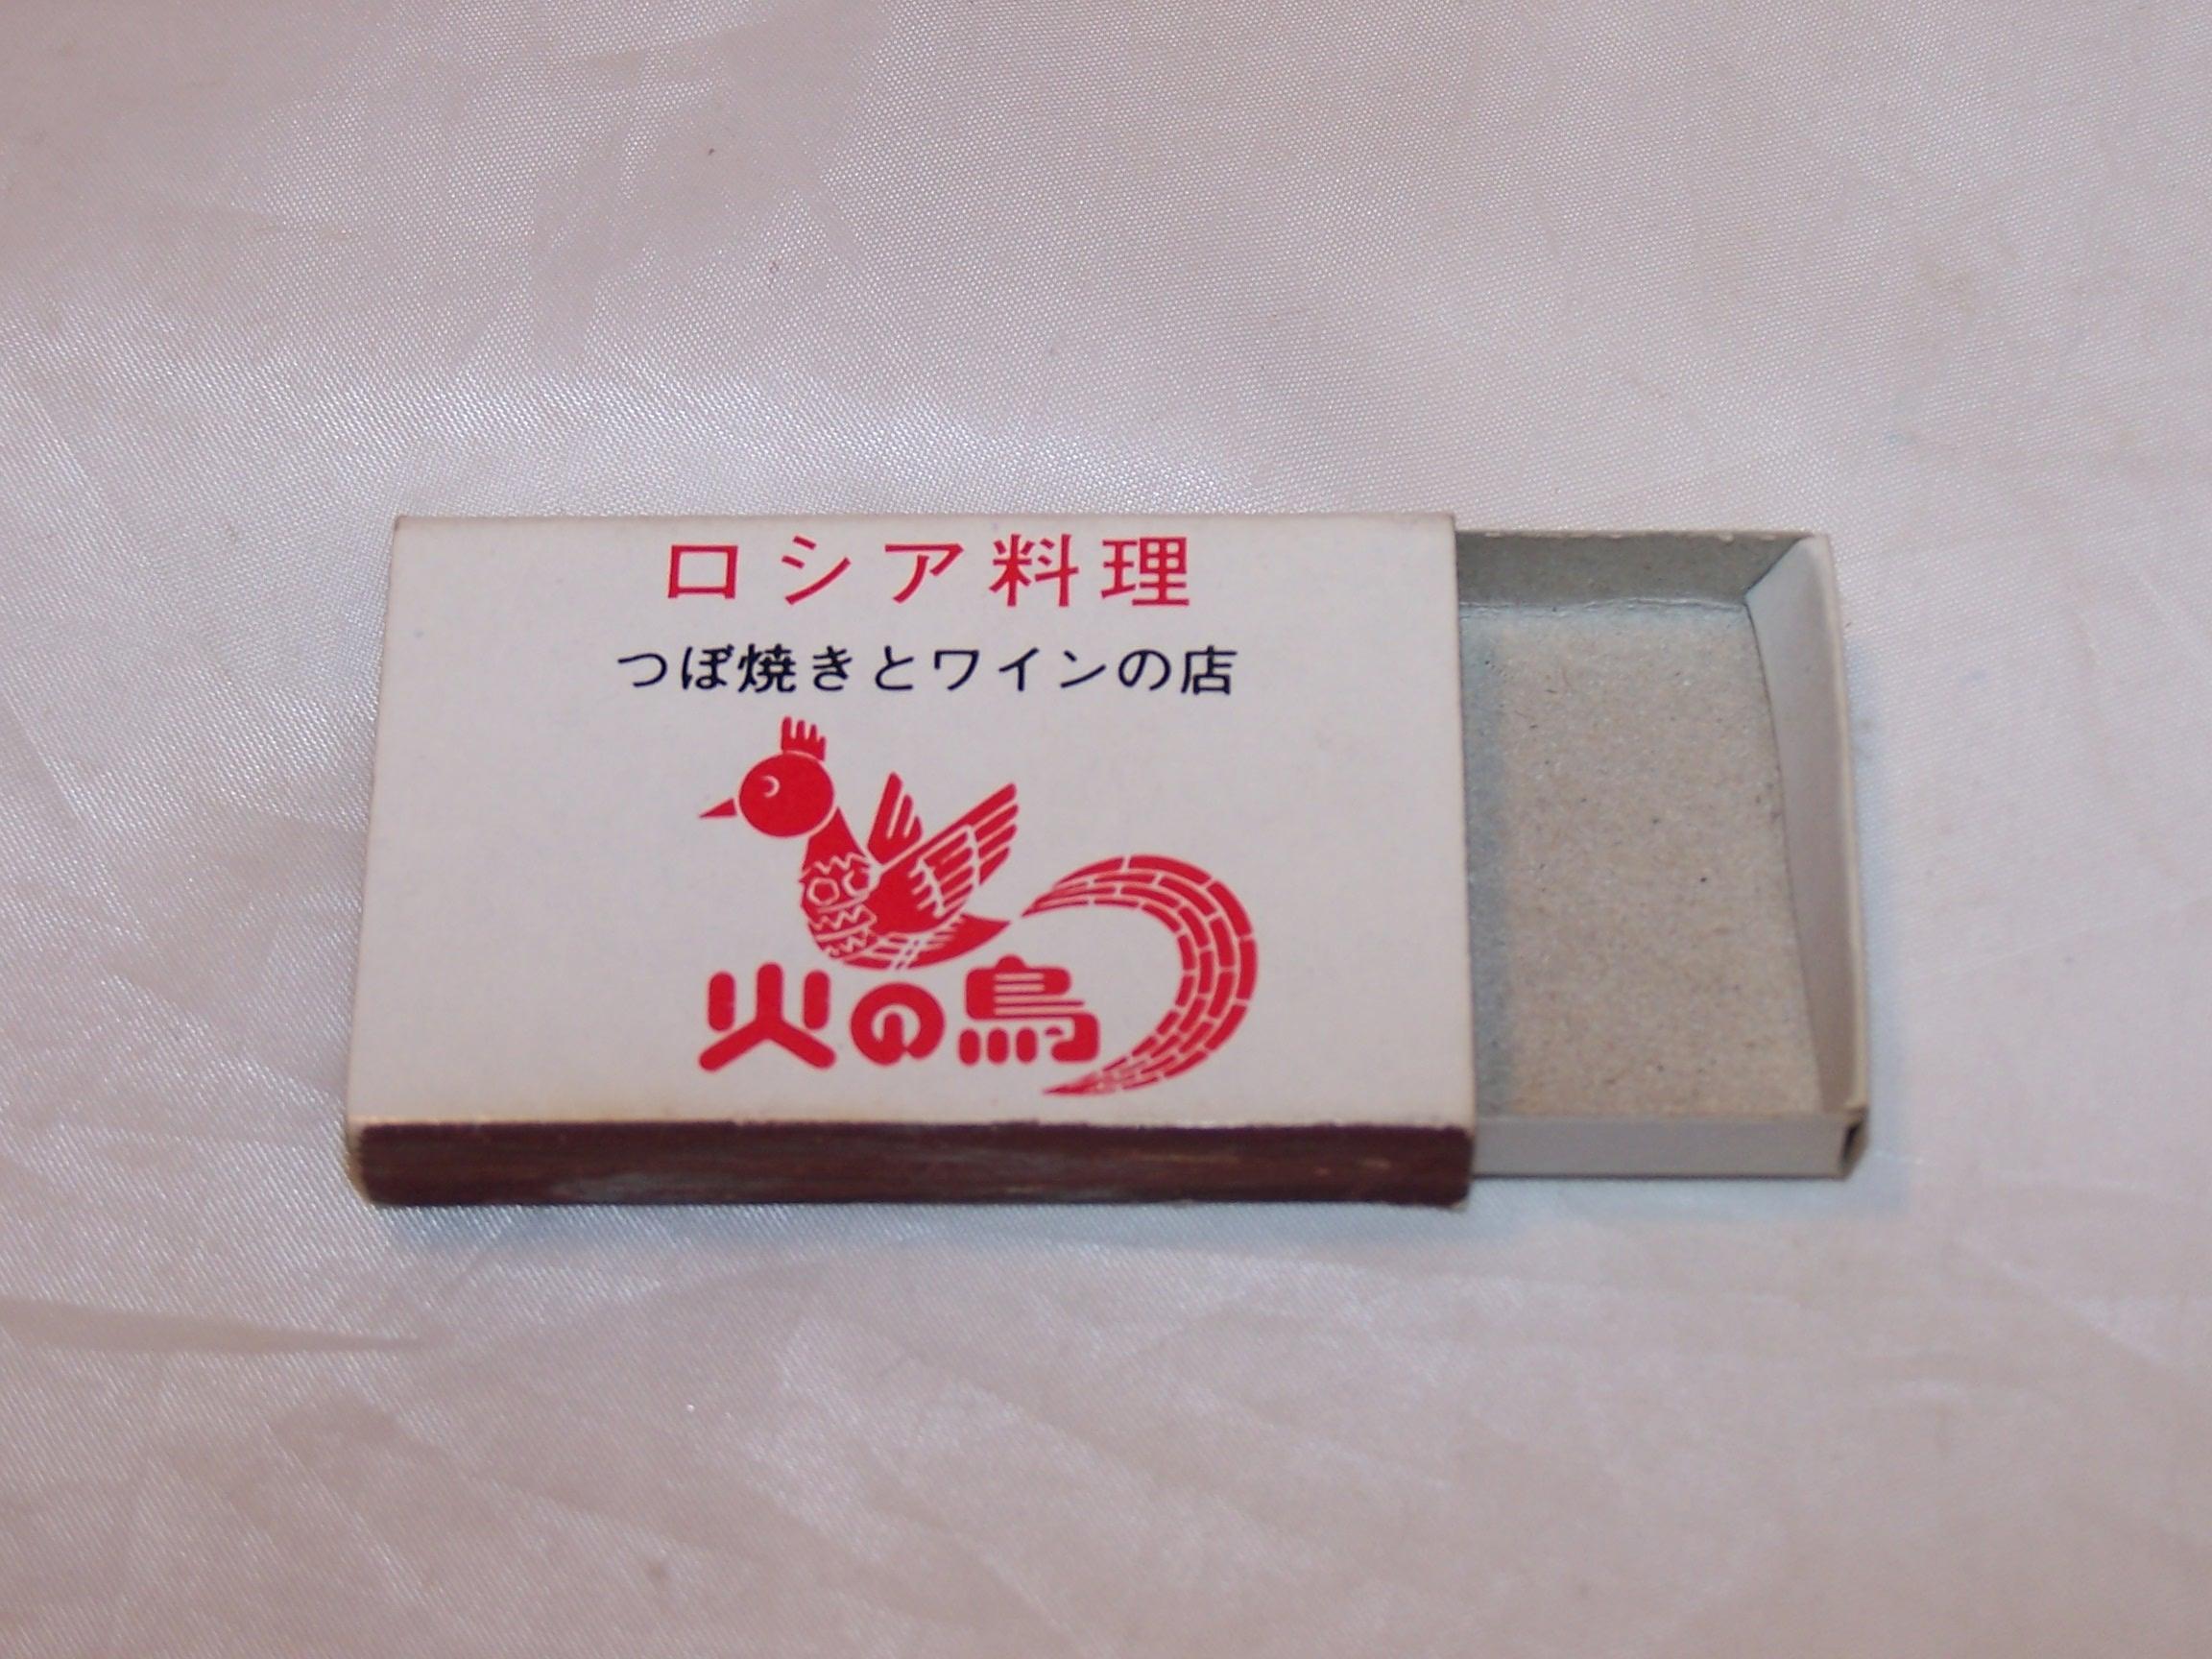 Image 4 of Firebird, Phoenix Chinese Matchbox, Vintage